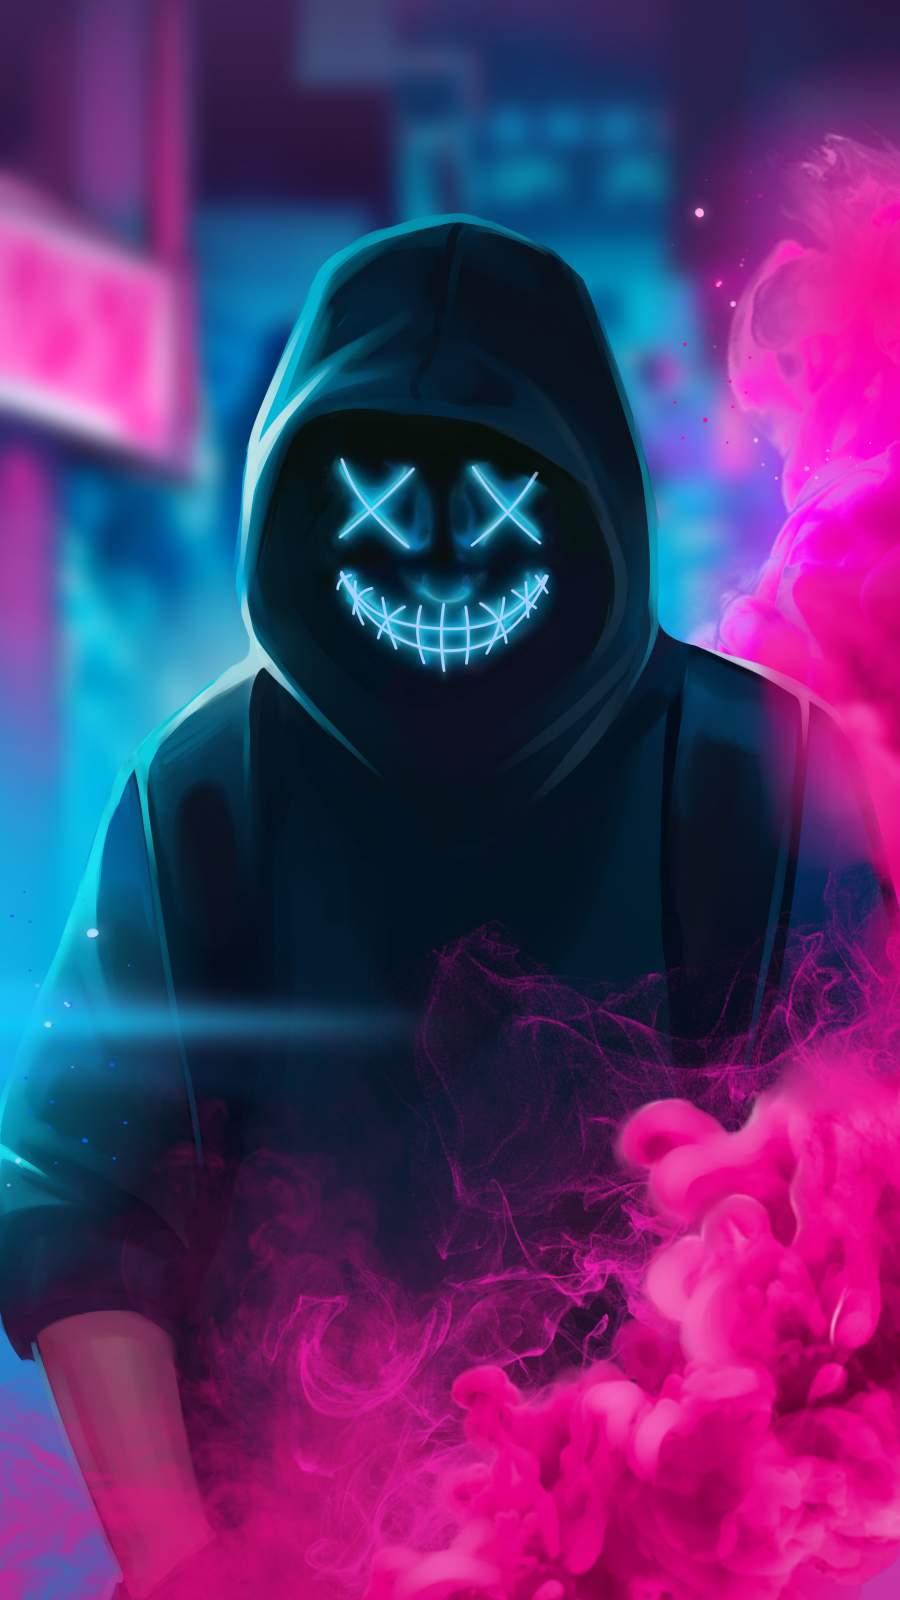 Neon Masked Hoodie Guy Smoke